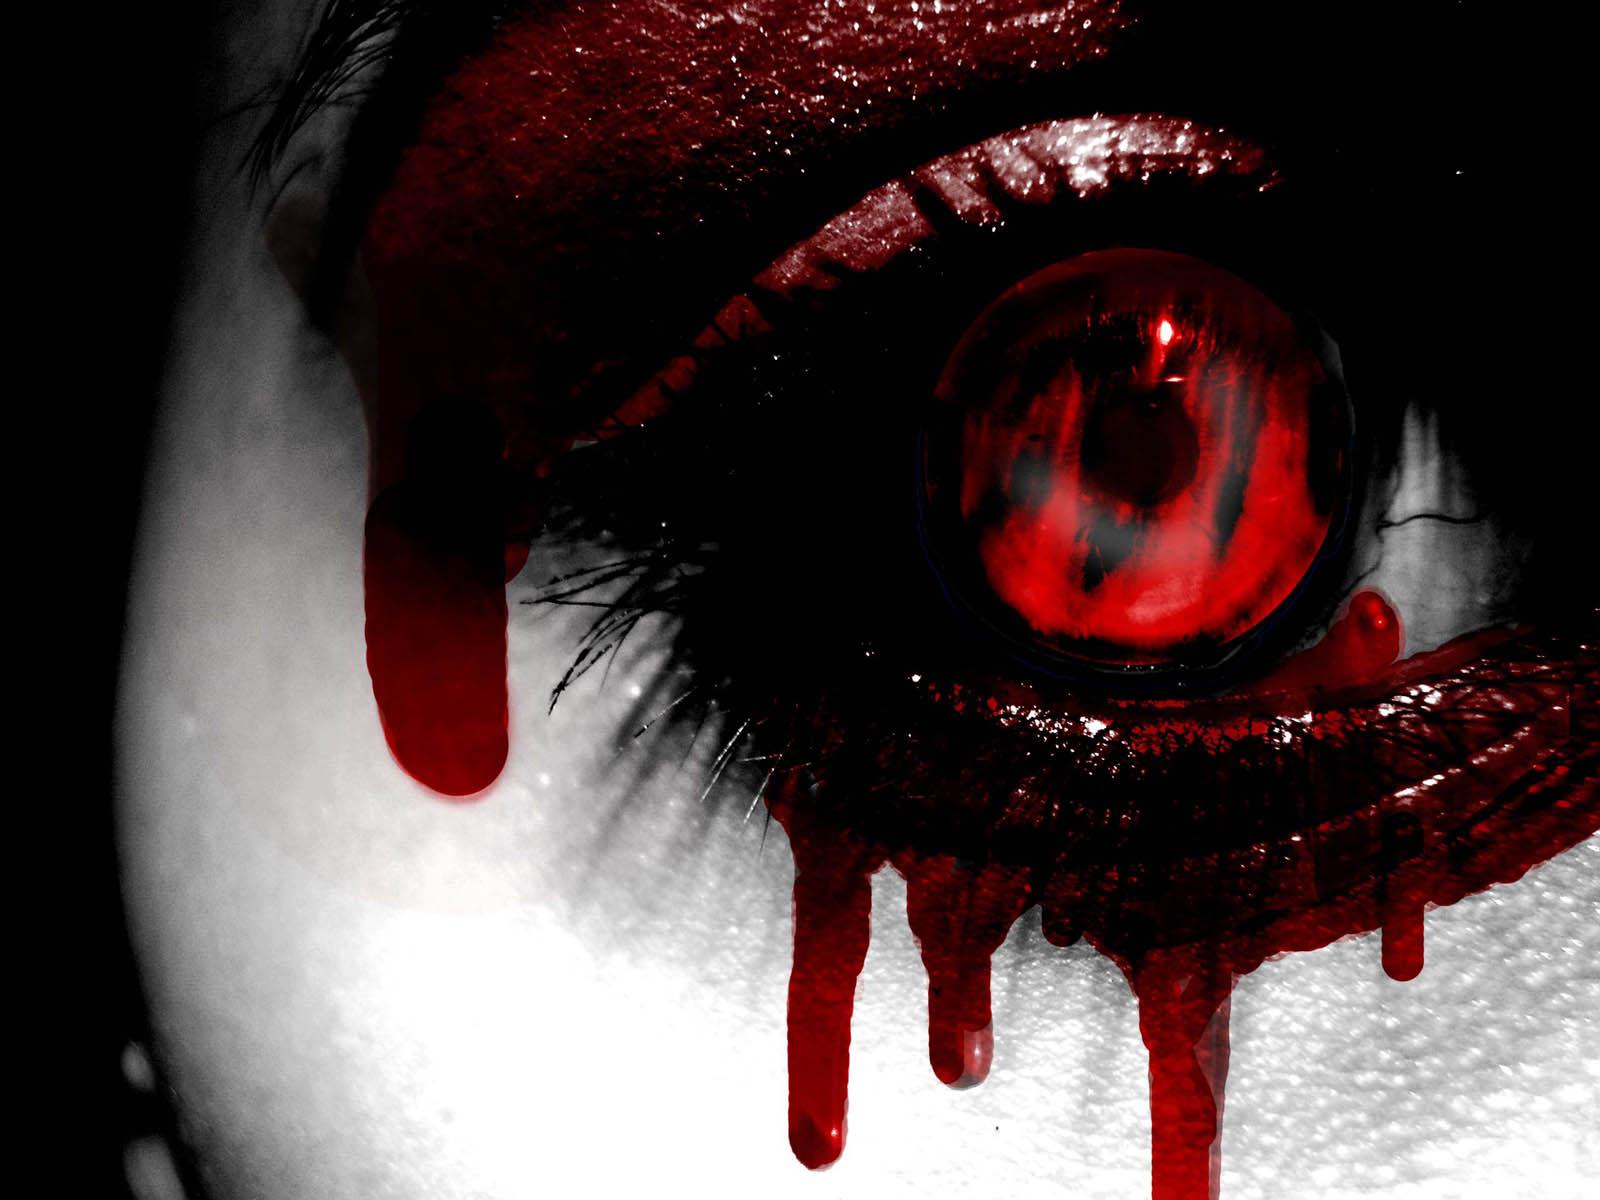 Keywords Horror Eye Wallpapers Horror EyeDesktop Wallpapers Horror 1600x1200